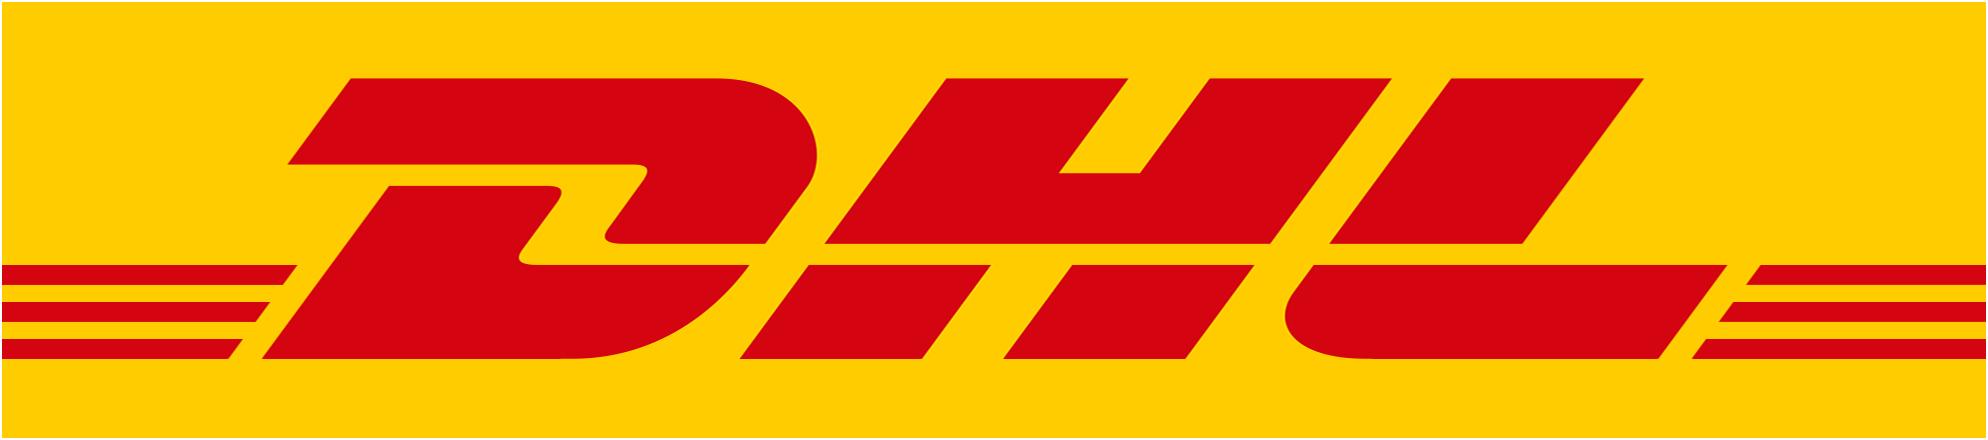 「DHL」の画像検索結果